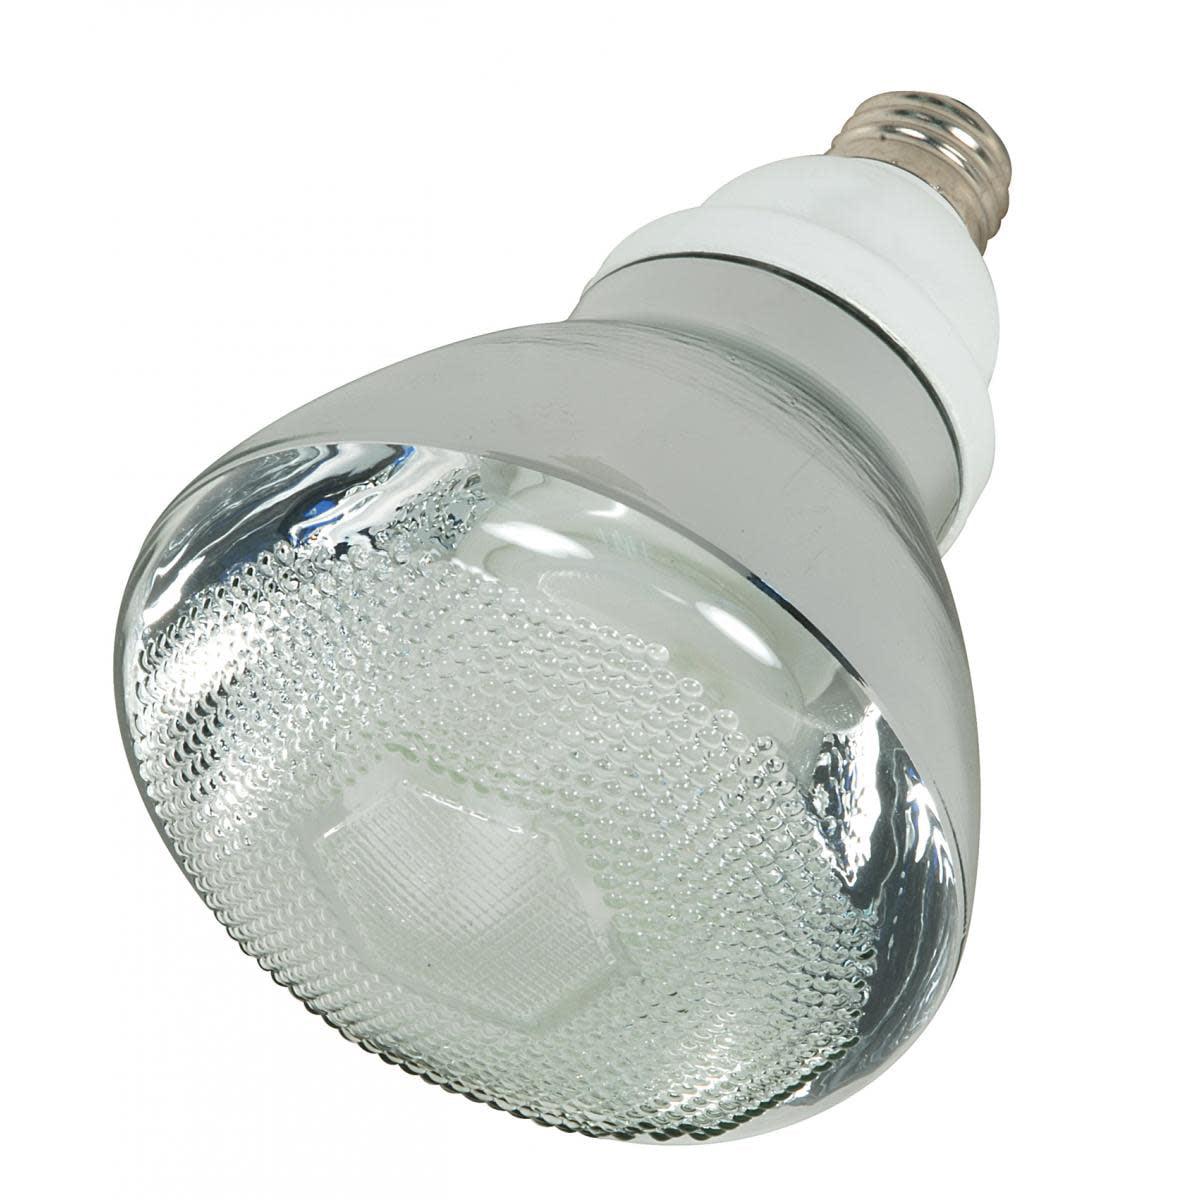 Satco Lighting S7275 Single 23 Watt BR38 Shaped Medium (E26) Base Compact Fluorescent Bulb